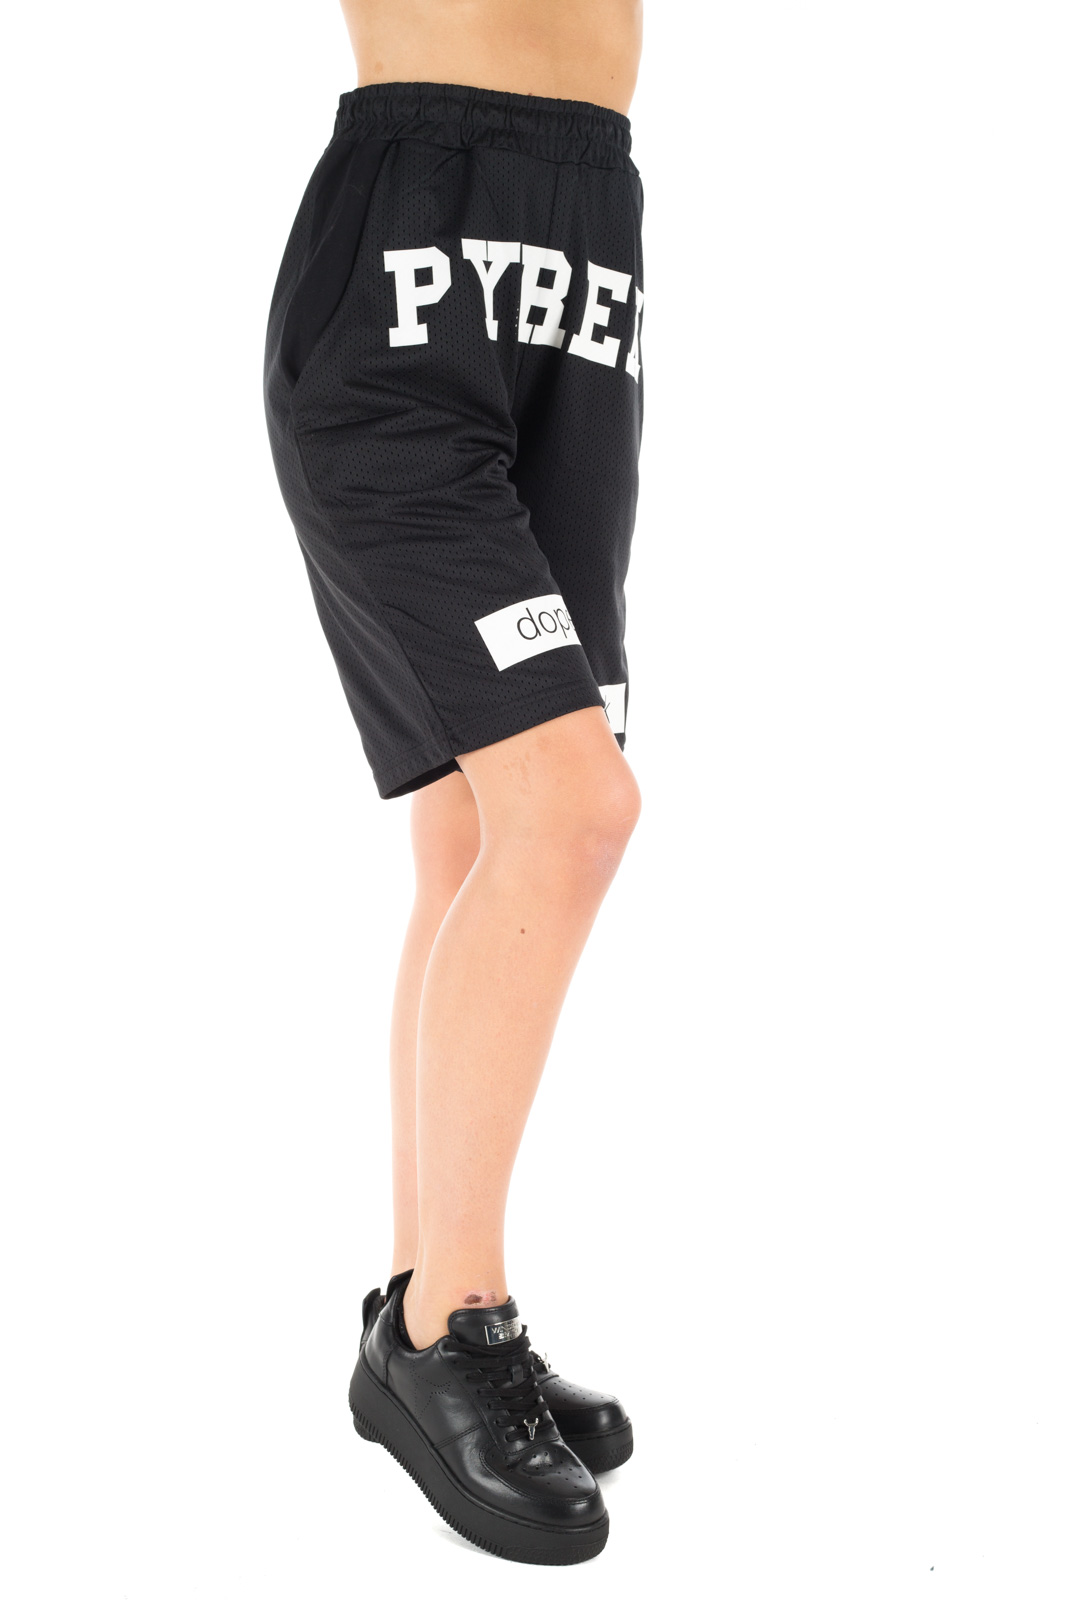 Pyrex Pantaloncini Basket Neri Unisex - Calibro Shop